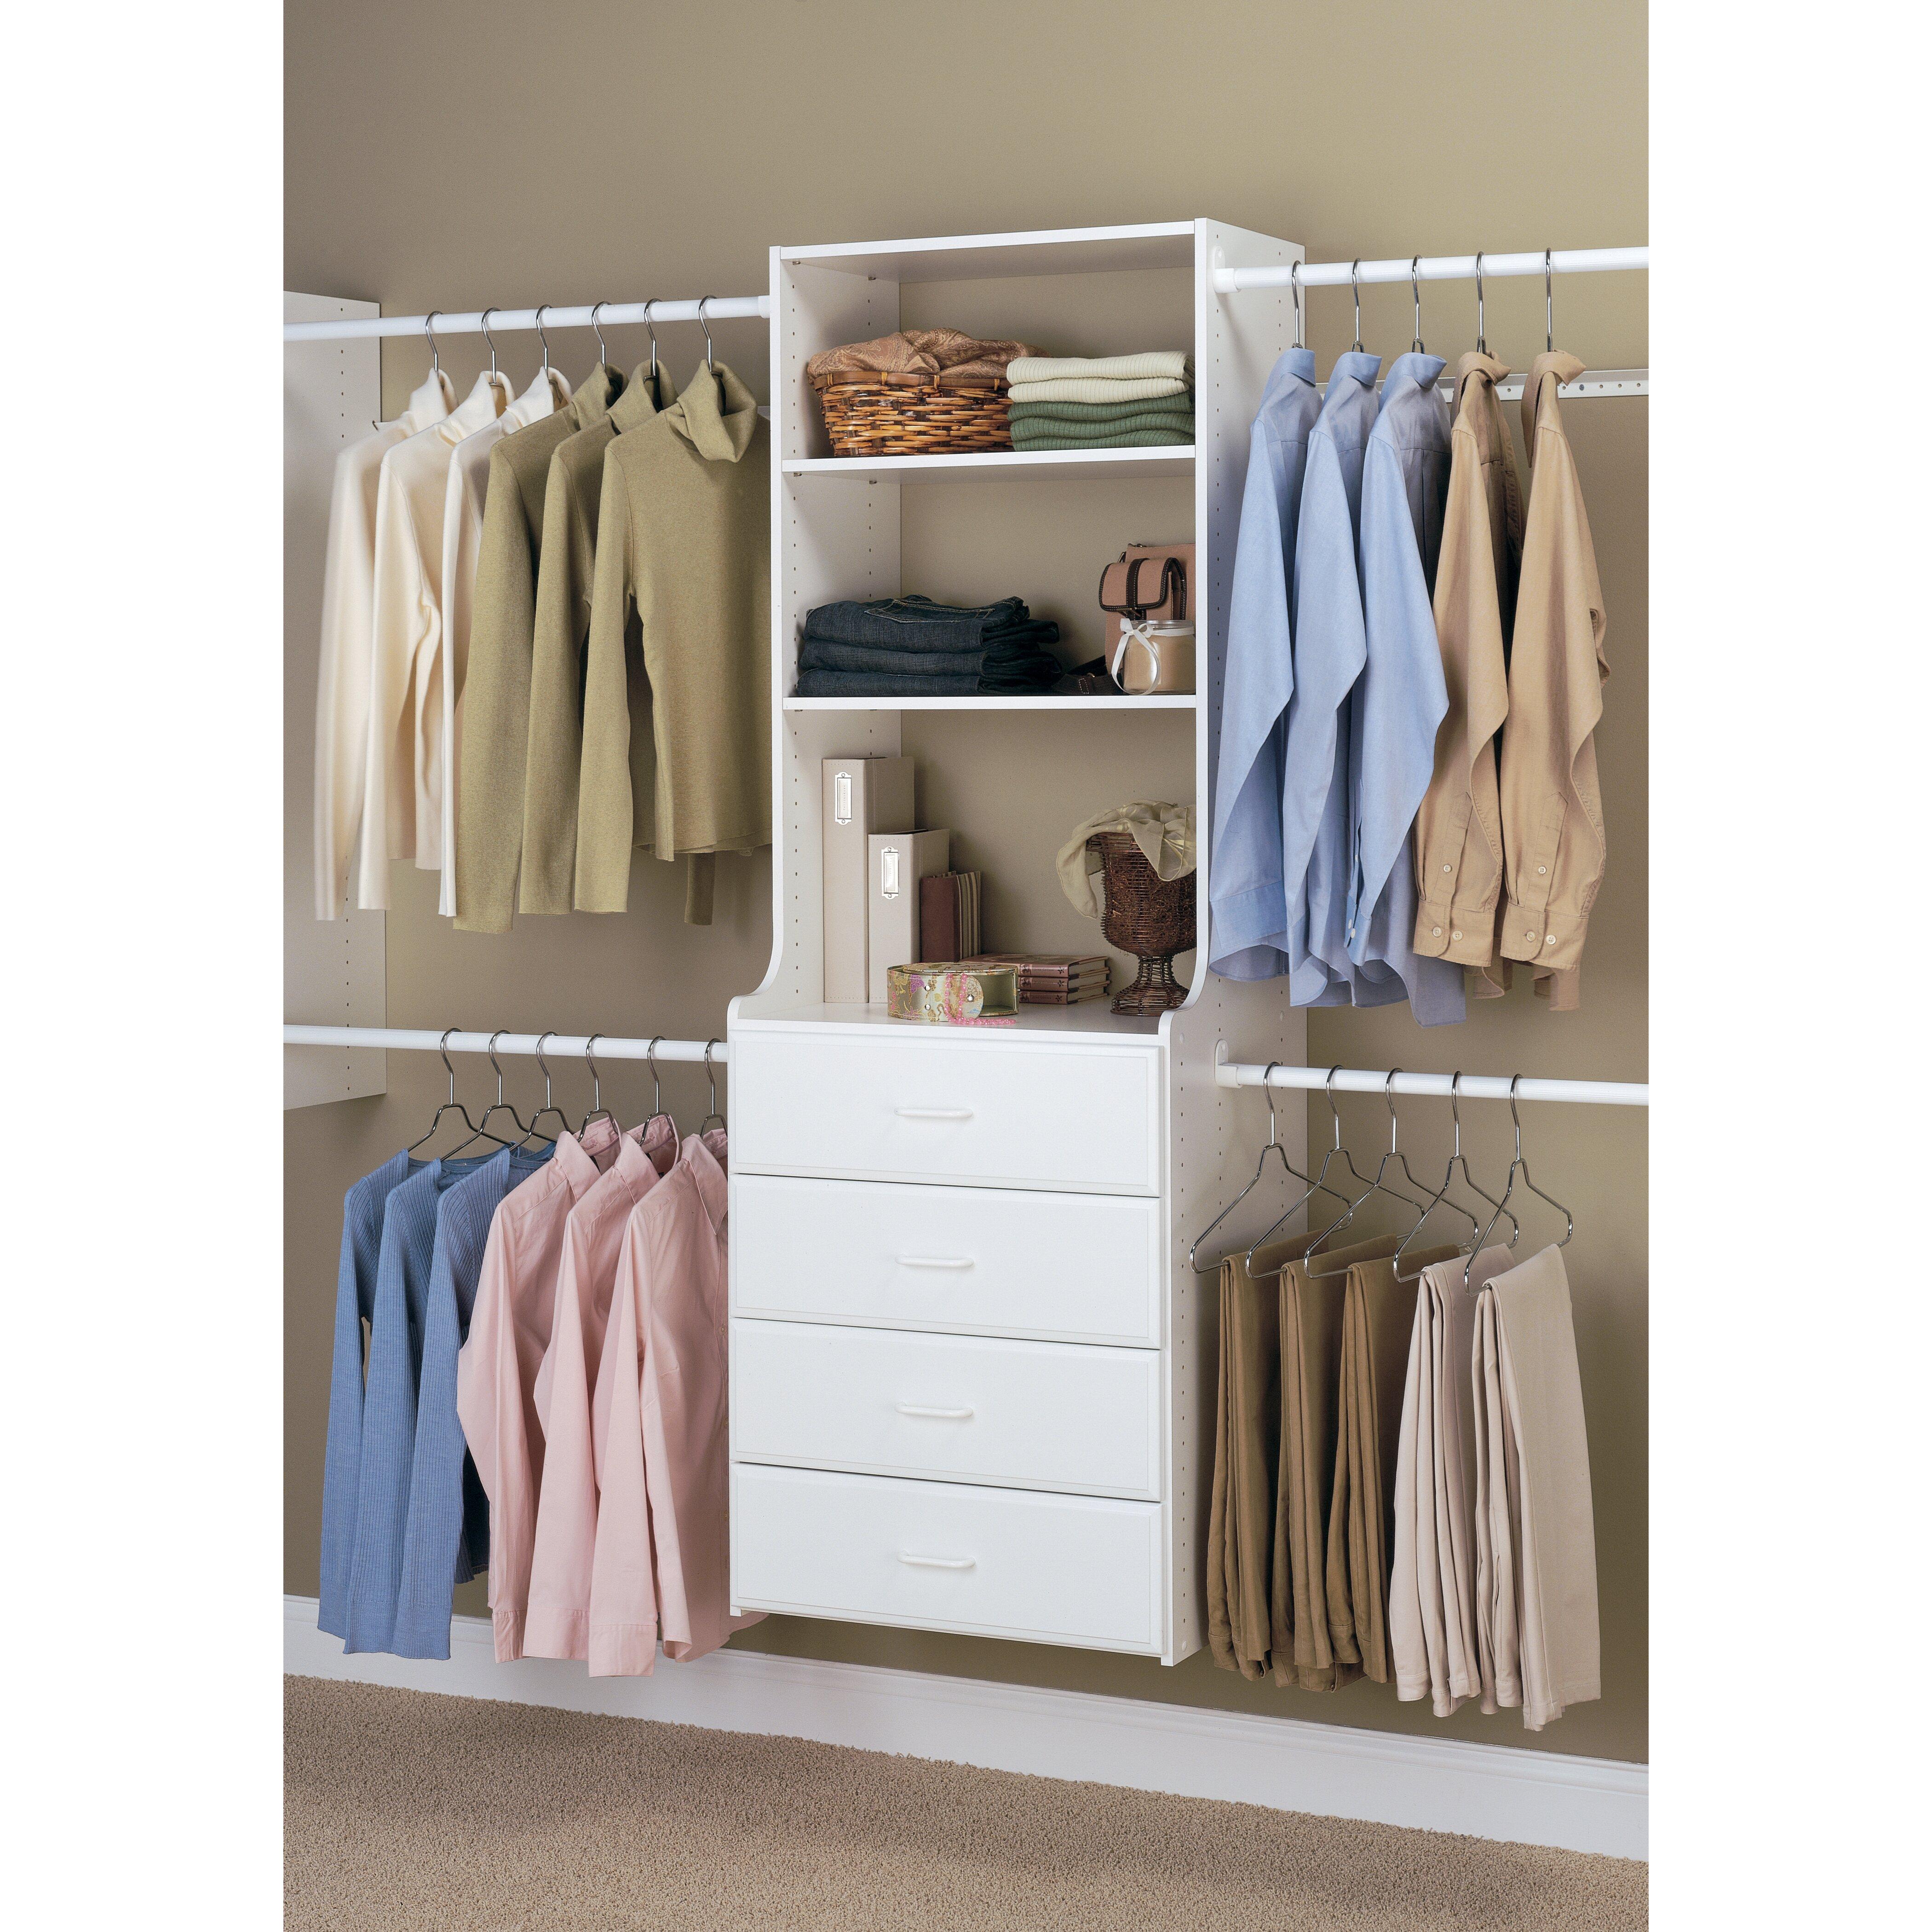 easy track hanging 24 wide closet system reviews wayfair. Black Bedroom Furniture Sets. Home Design Ideas